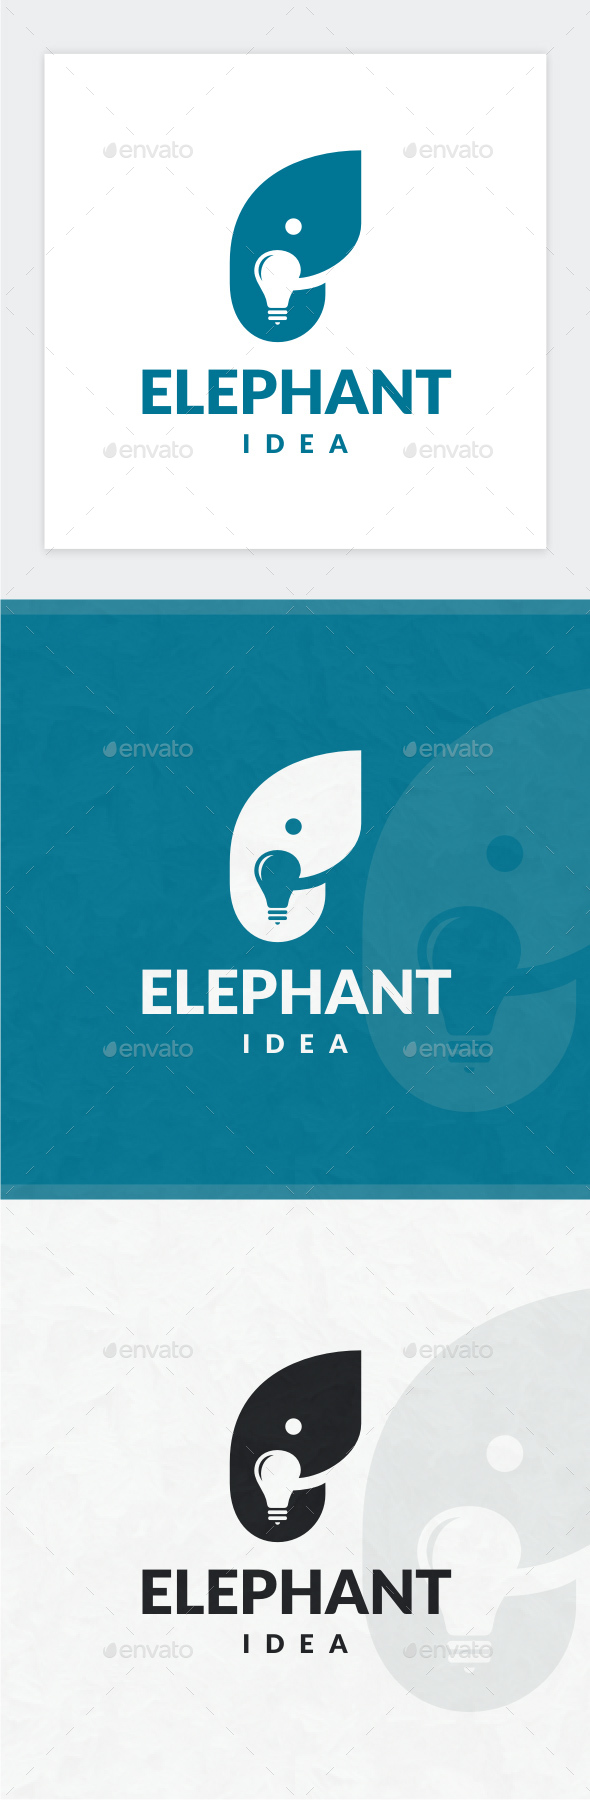 Elephant Idea Logo - Animals Logo Templates